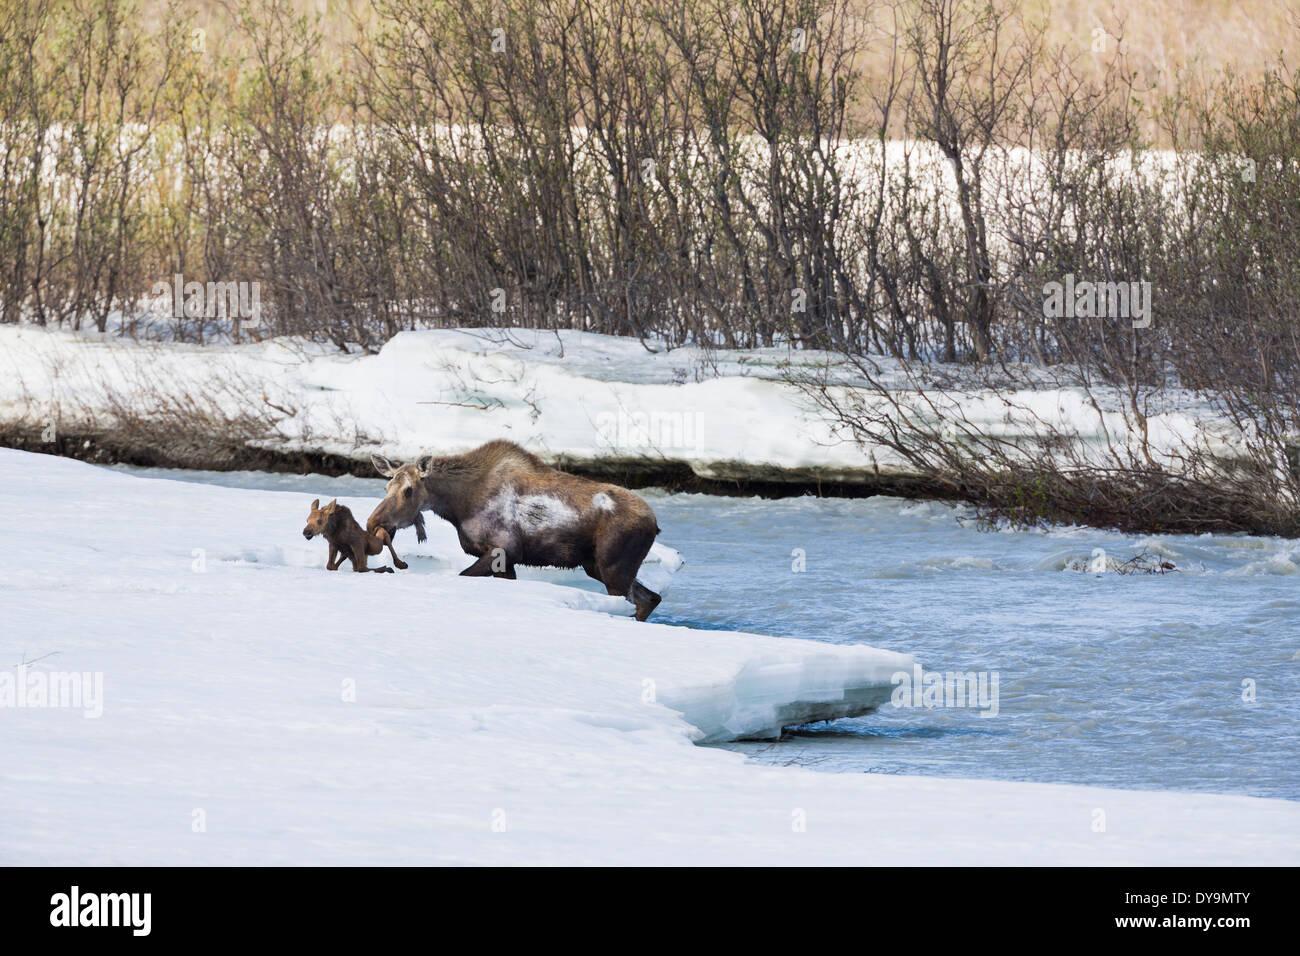 Cow And Spring Calf Moose Navigate The Swift Waters Of Phelan Creek In Interior Alaska. - Stock Image